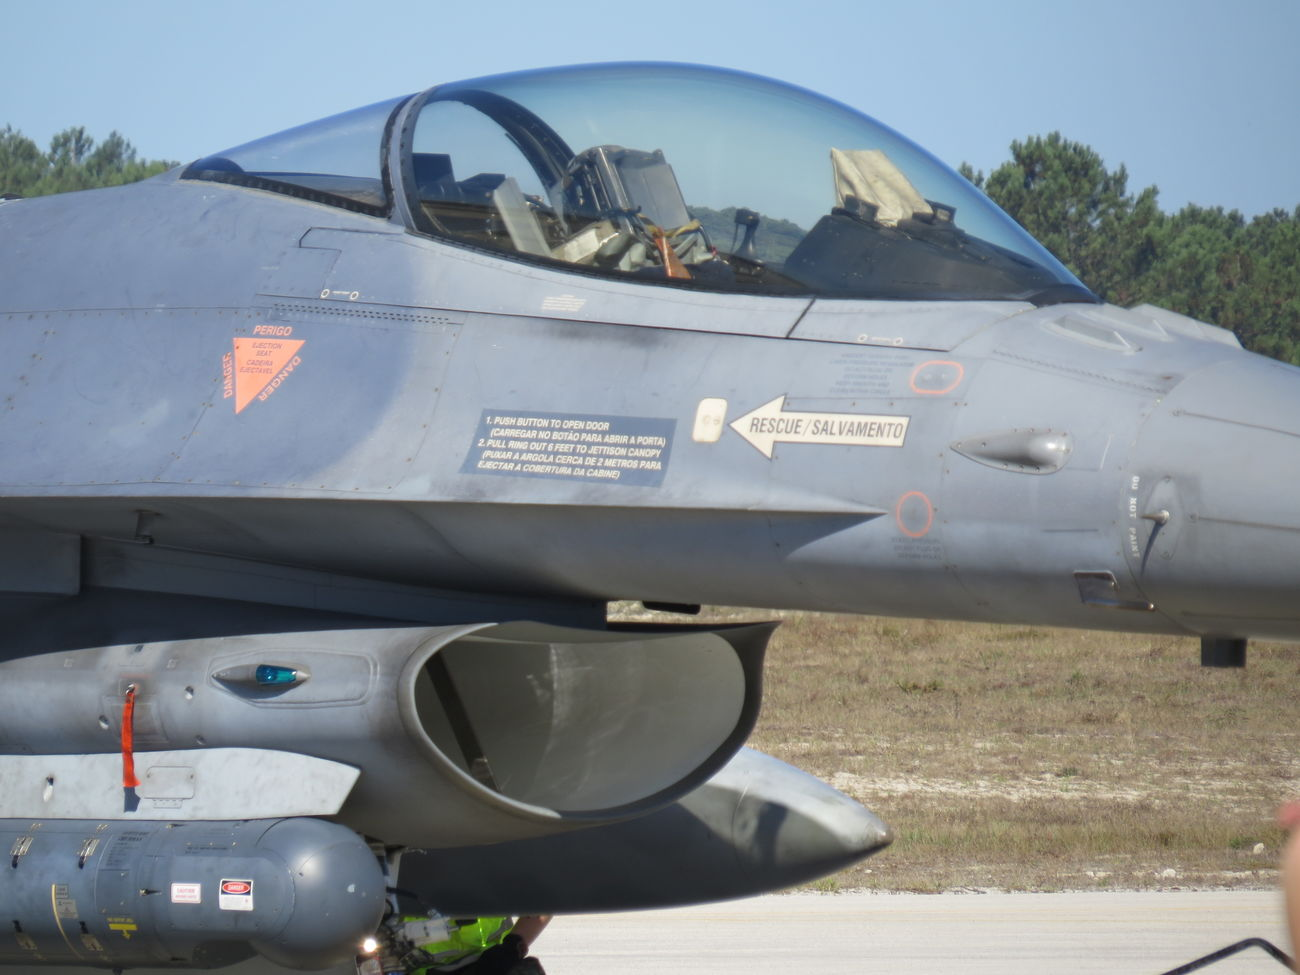 Transportation Aircraft Wing Aircrafts Aircraft Photography Aircraft F16fightingfalcon F16C F16 Aircraft F16 Aeroplane Angle And Perspective